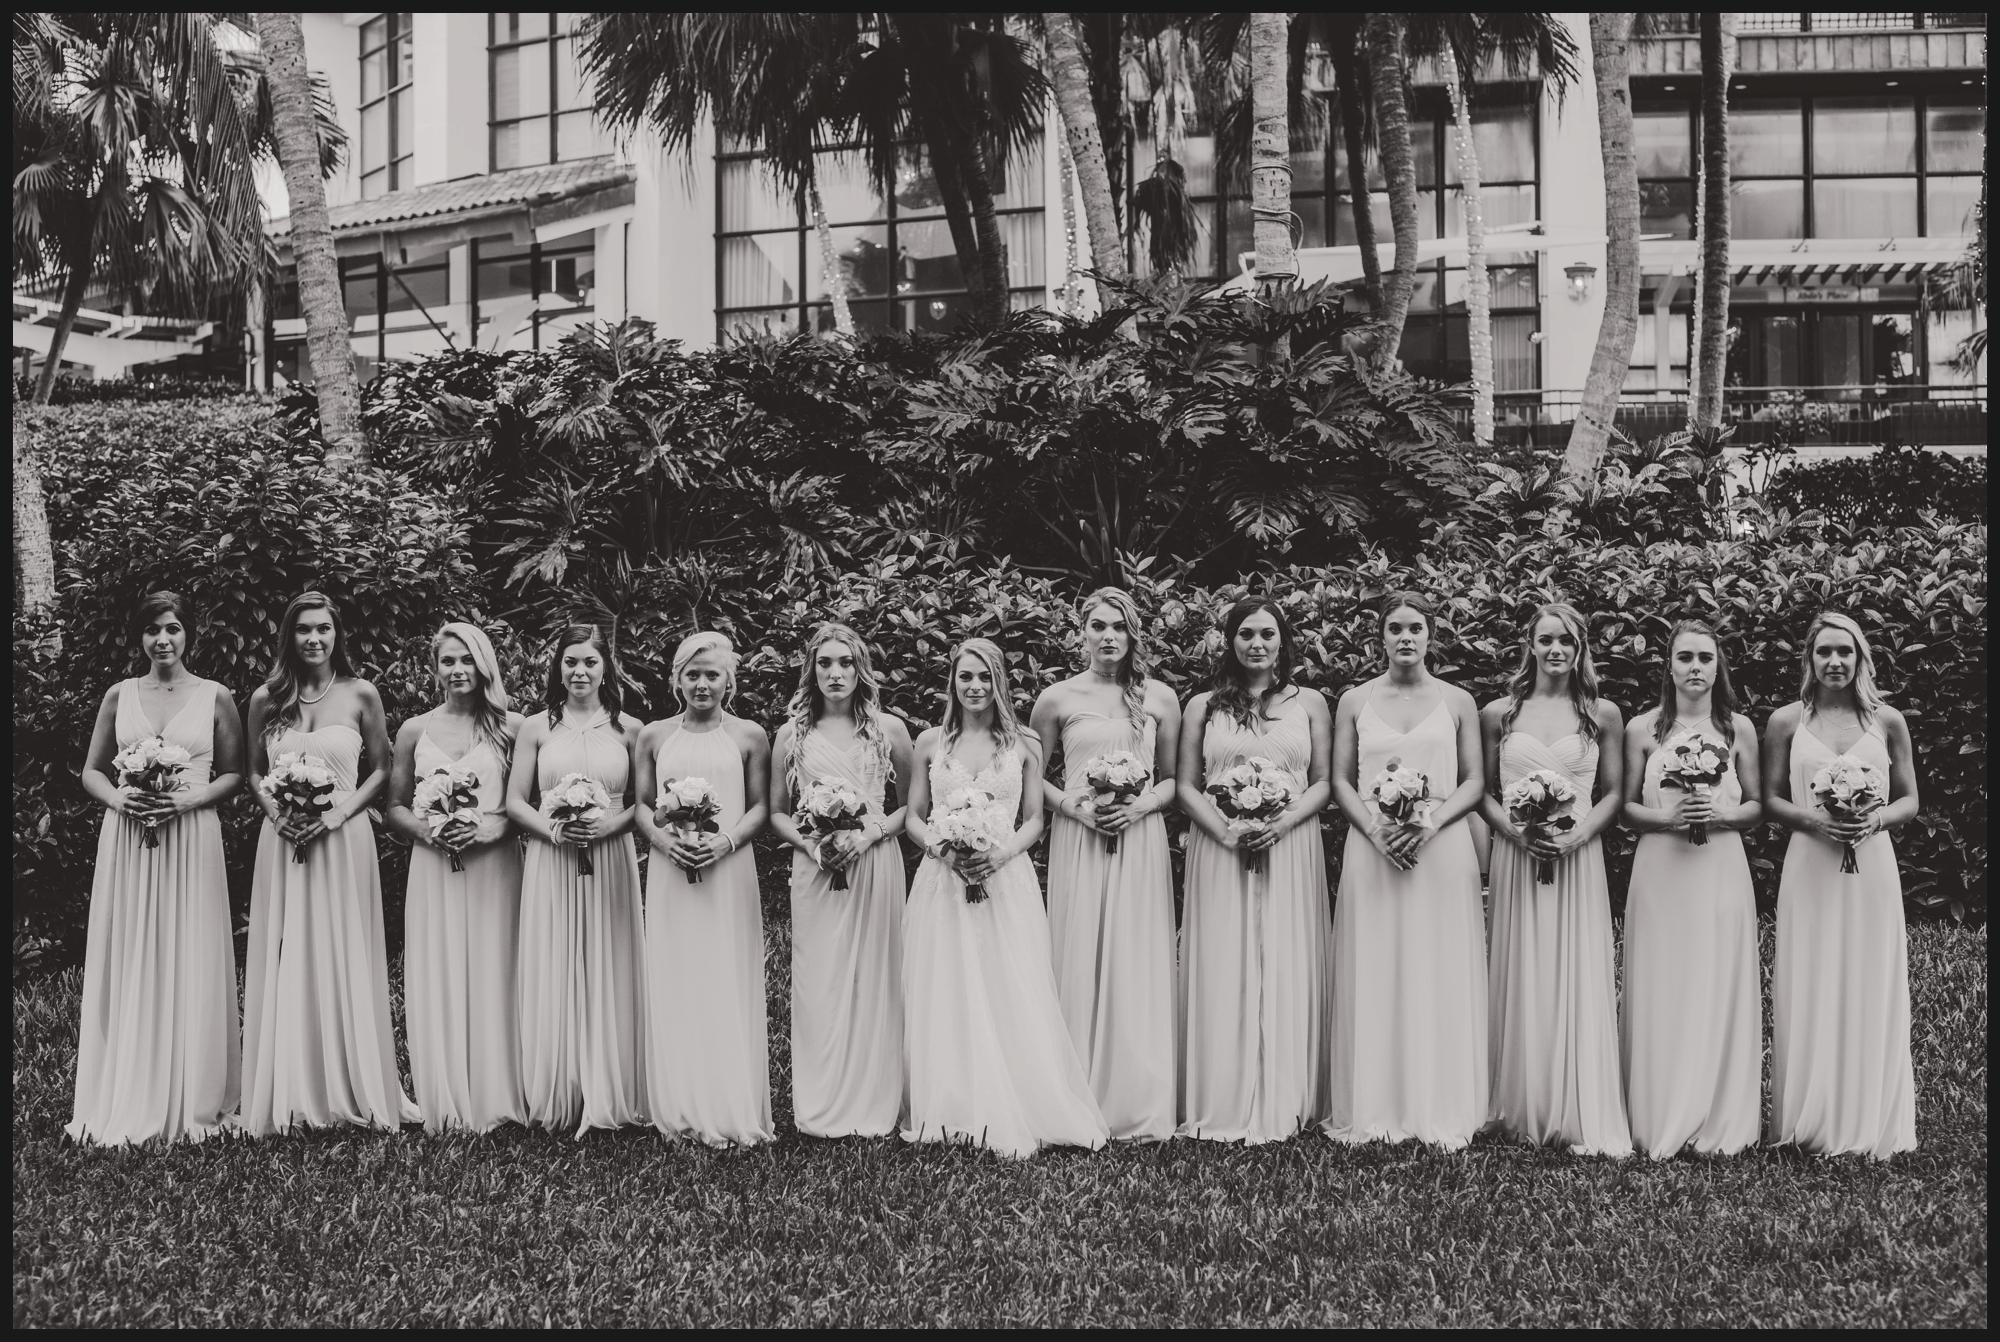 Orlando-Wedding-Photographer-destination-wedding-photographer-florida-wedding-photographer-bohemian-wedding-photographer_0064.jpg